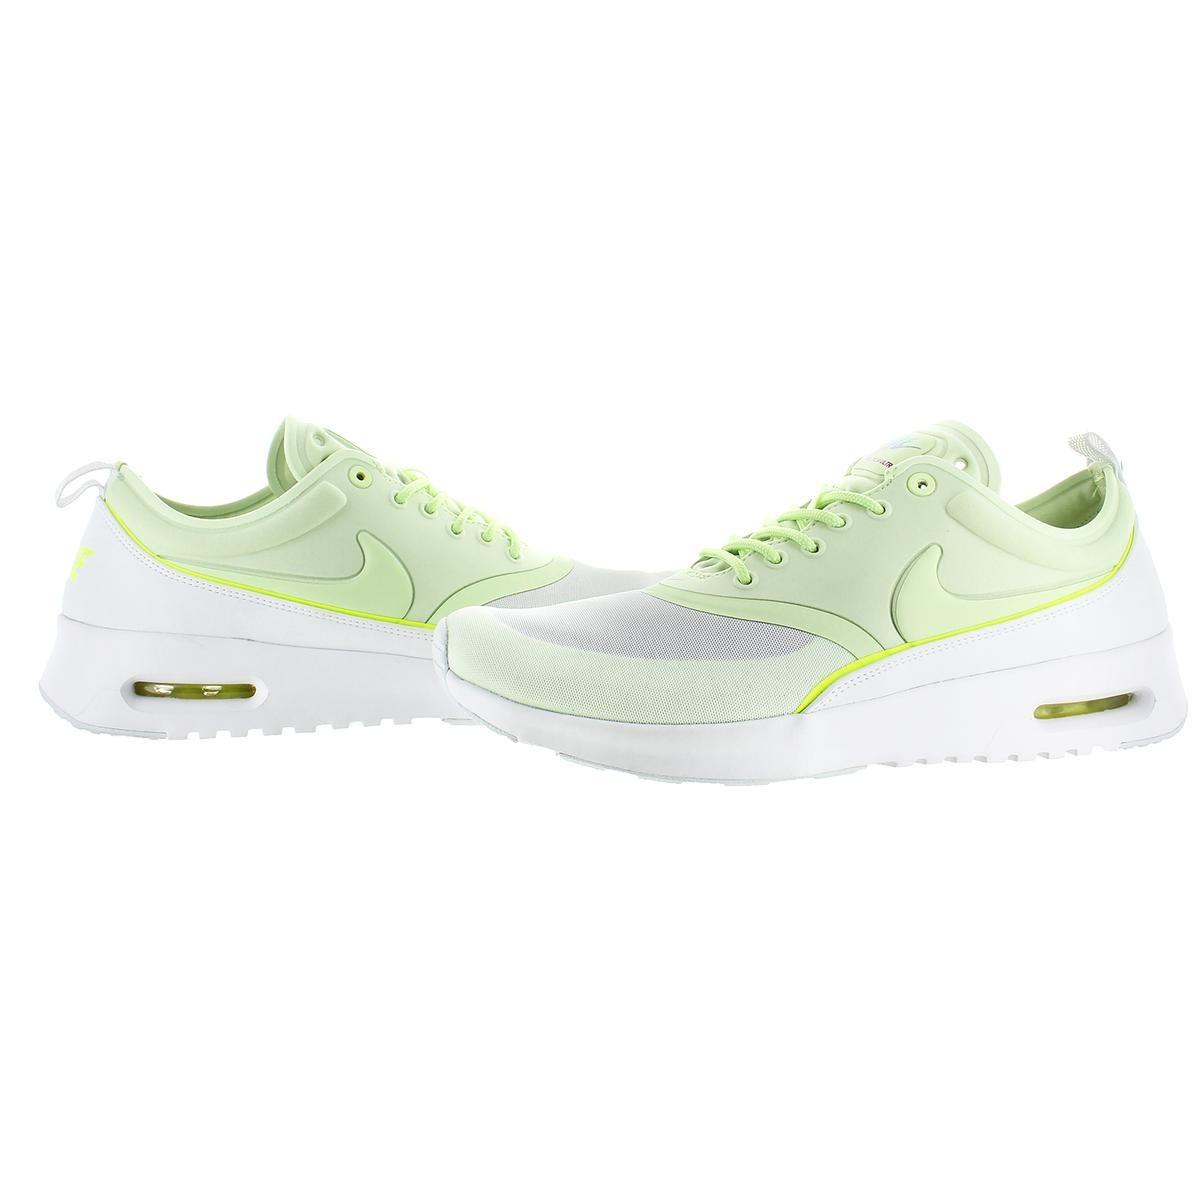 Nike Womens Air Max Thea Ultra Malla Perforada Zapatillas